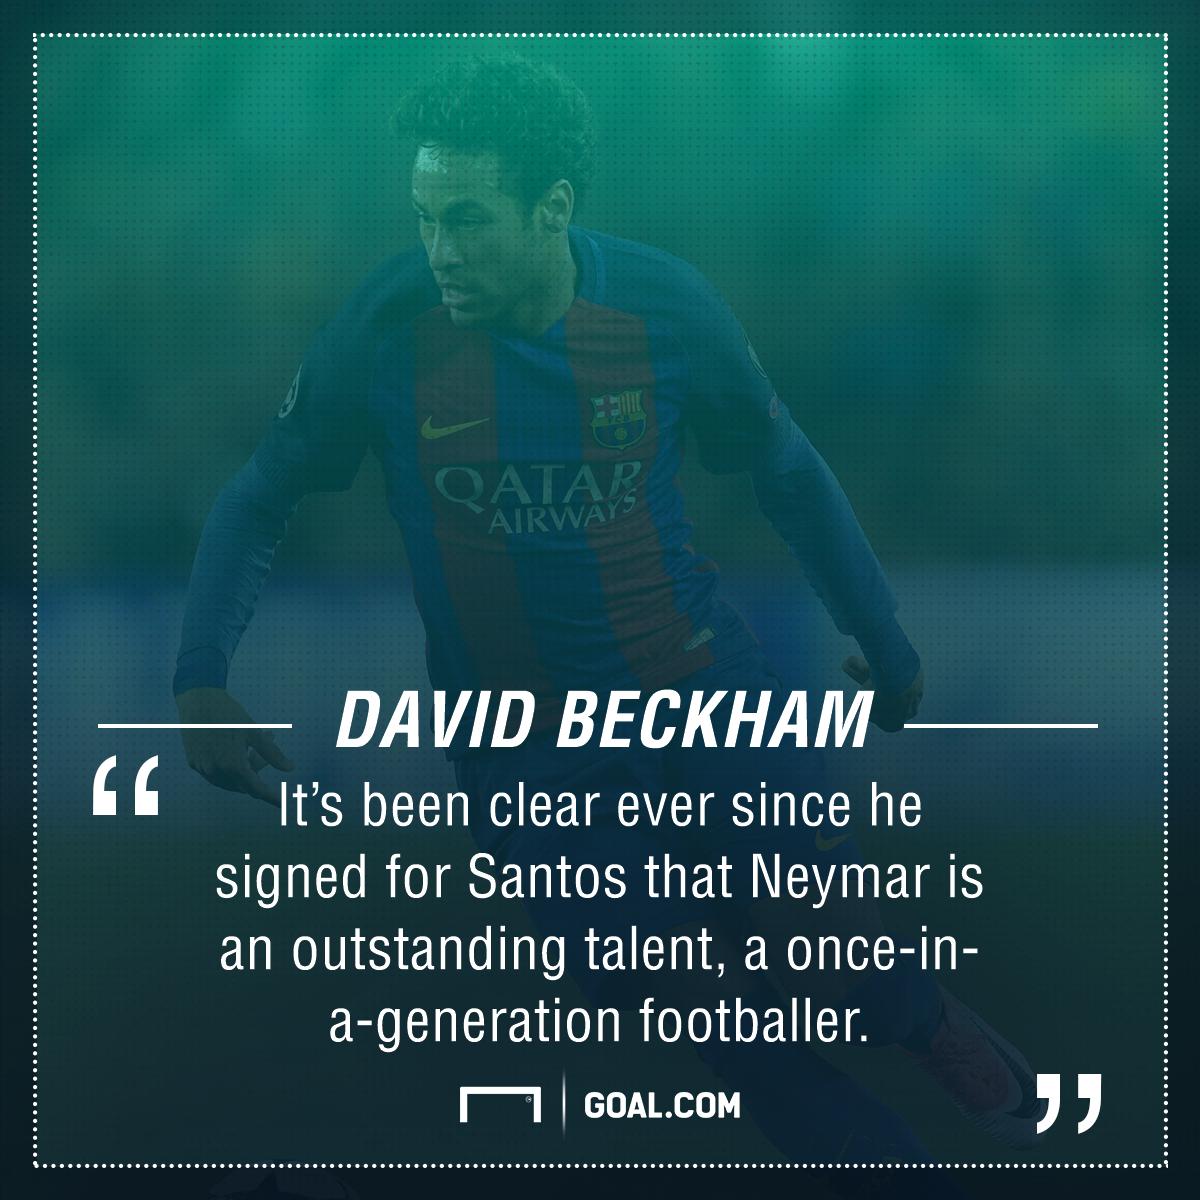 David Beckham Neymar